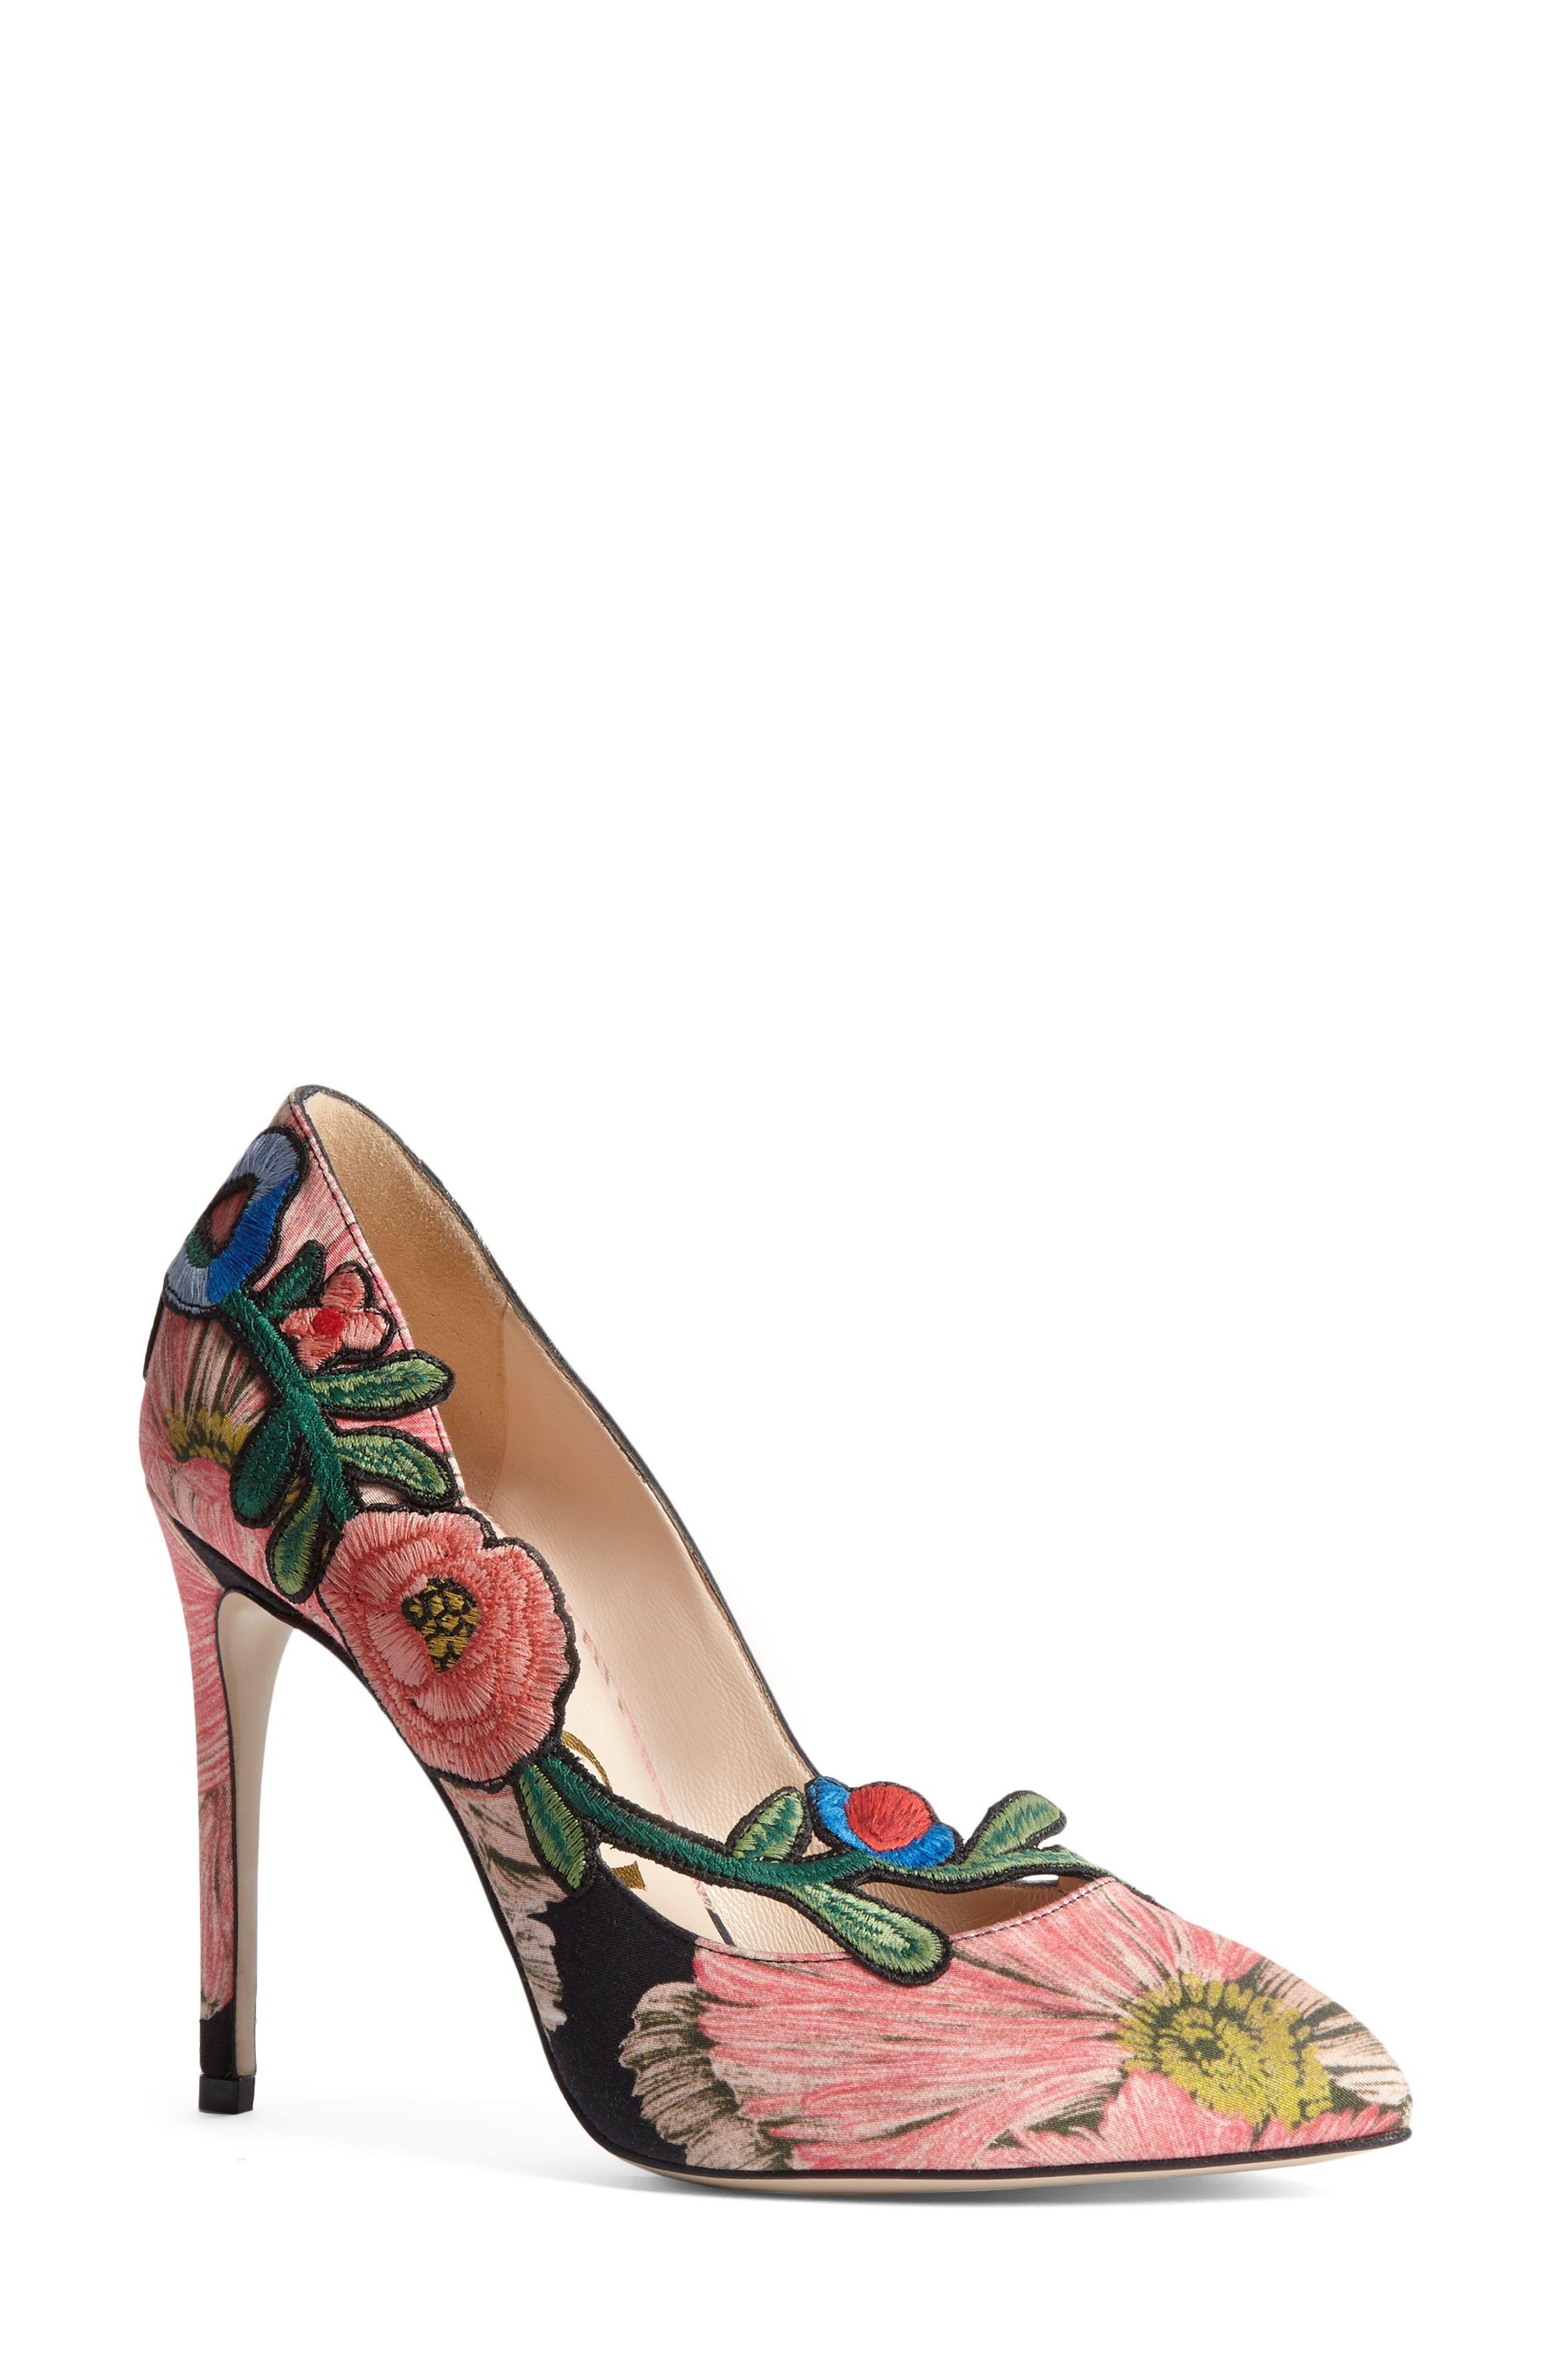 Main Image - Gucci Ophelia Floral Pump (Women)